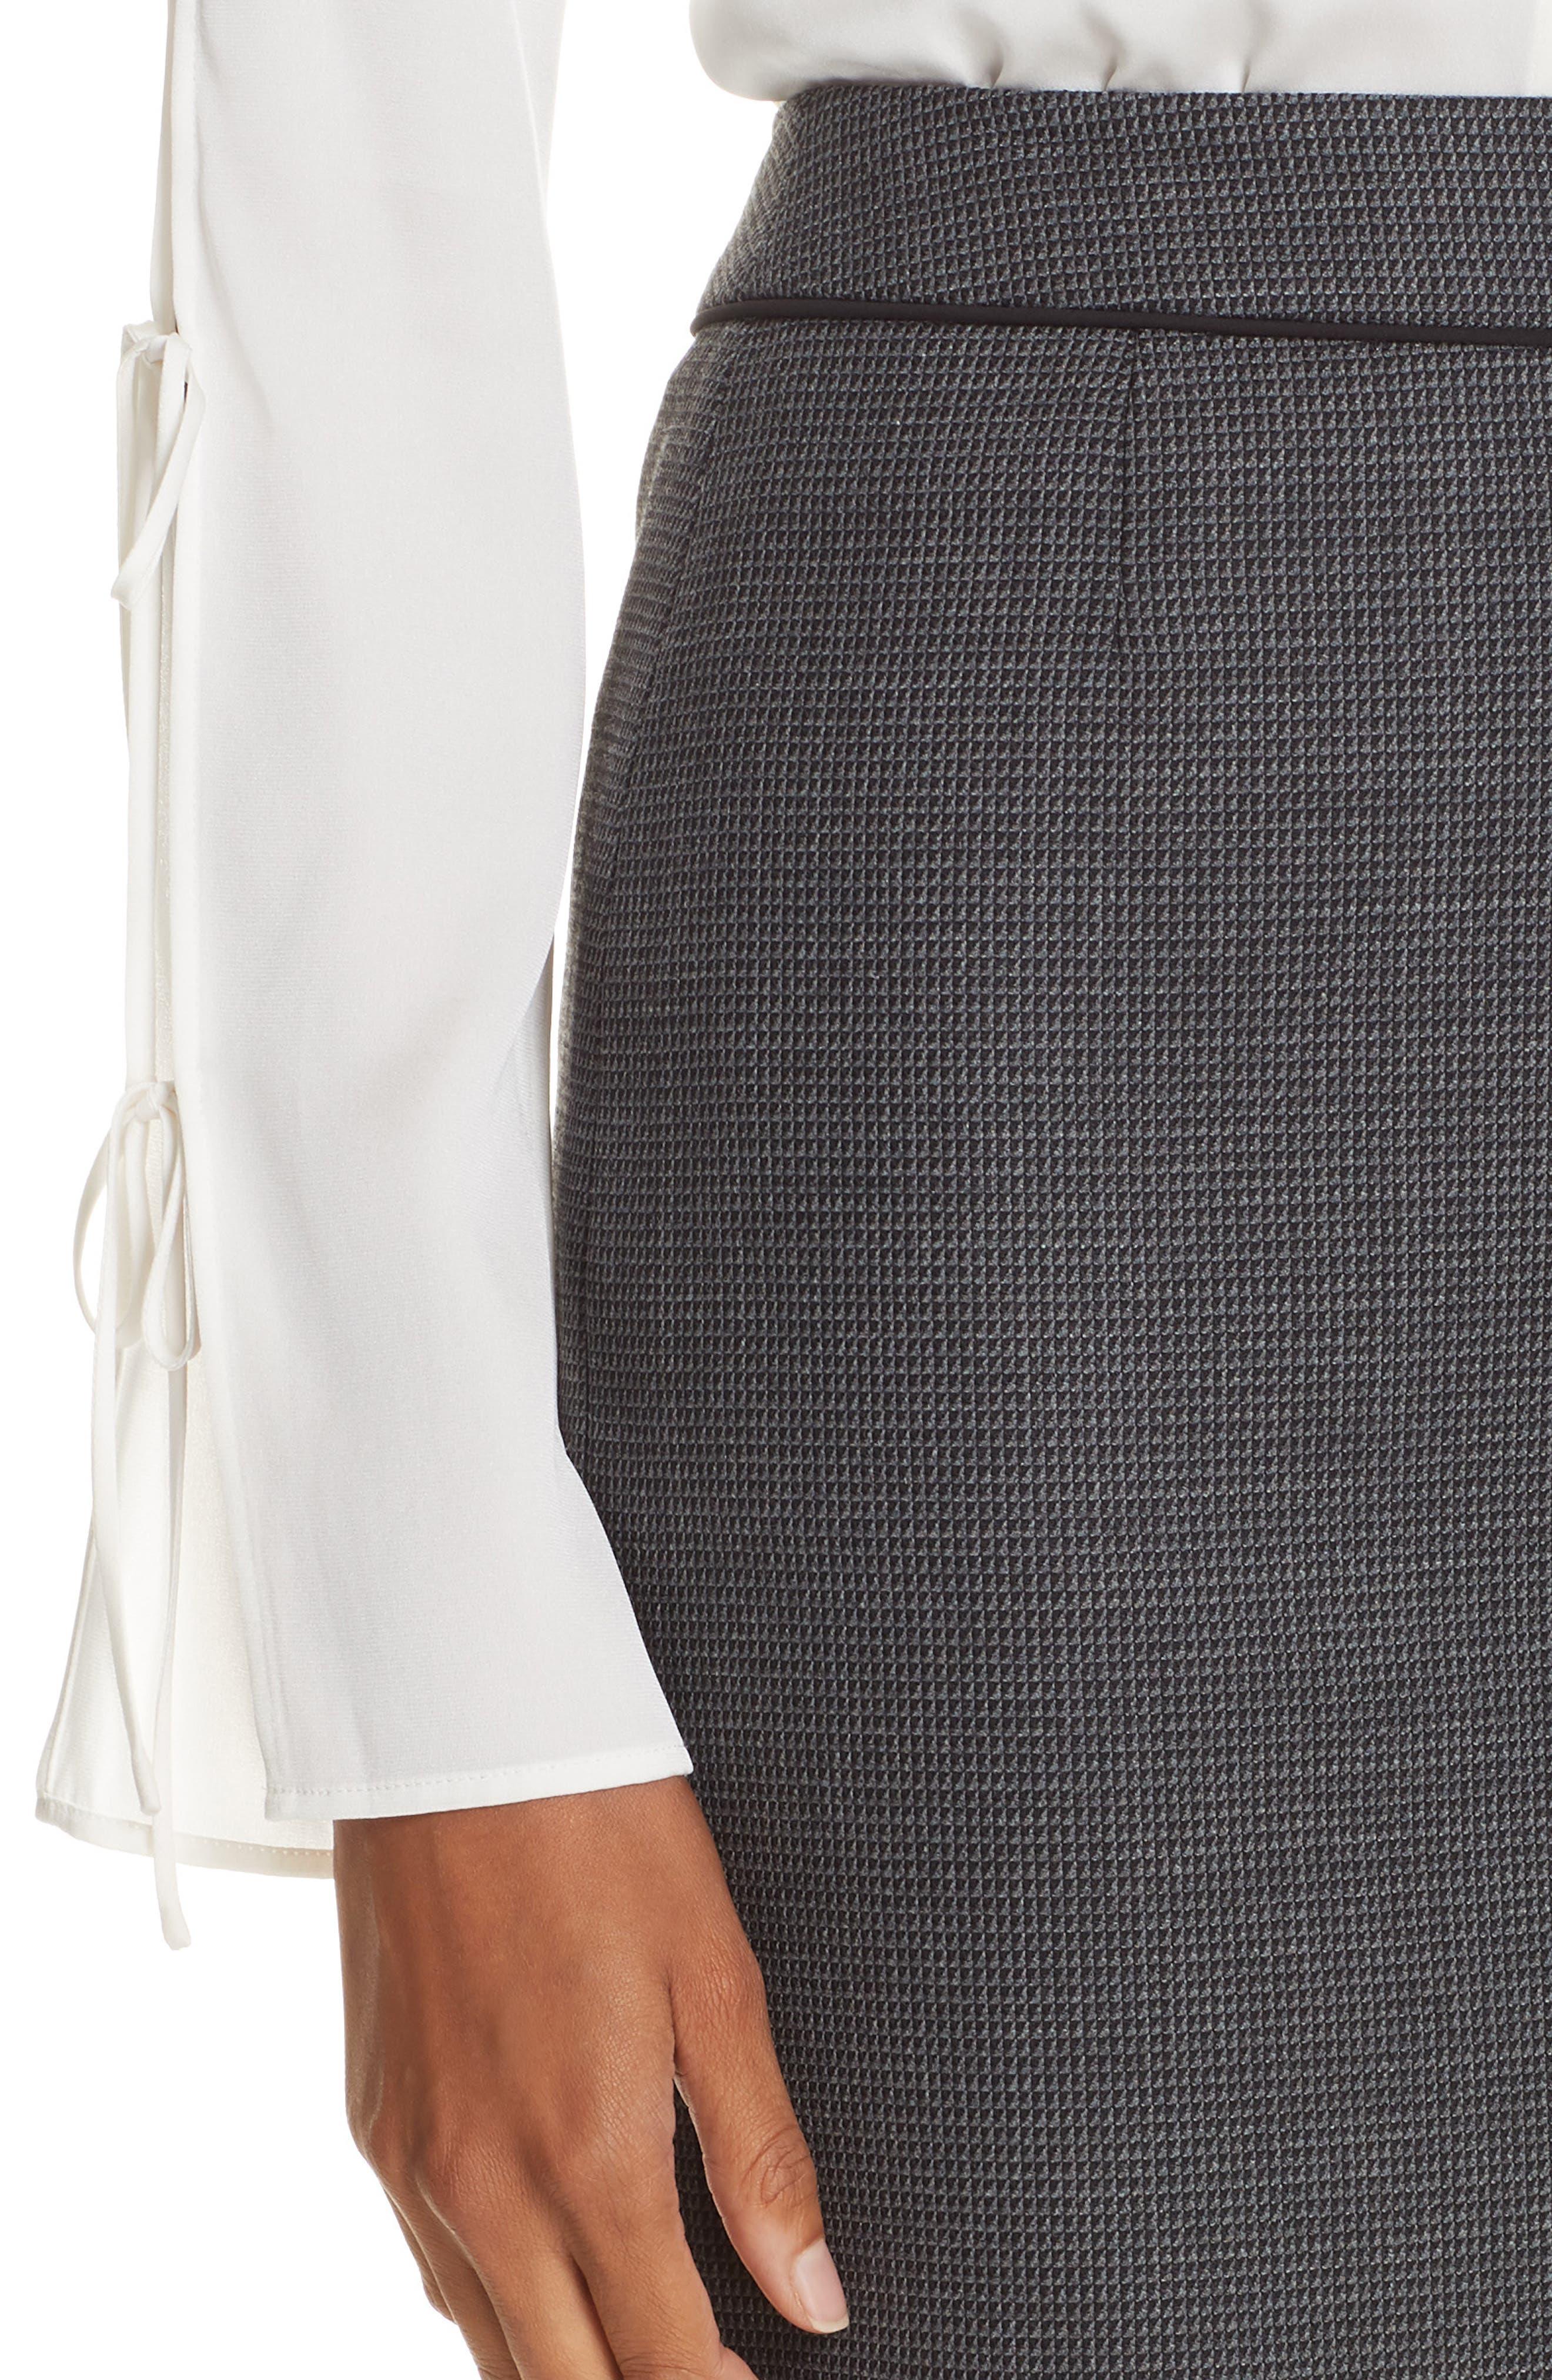 Vorita Geometric Wool Blend Suit Skirt,                             Alternate thumbnail 4, color,                             GREY FANTASY